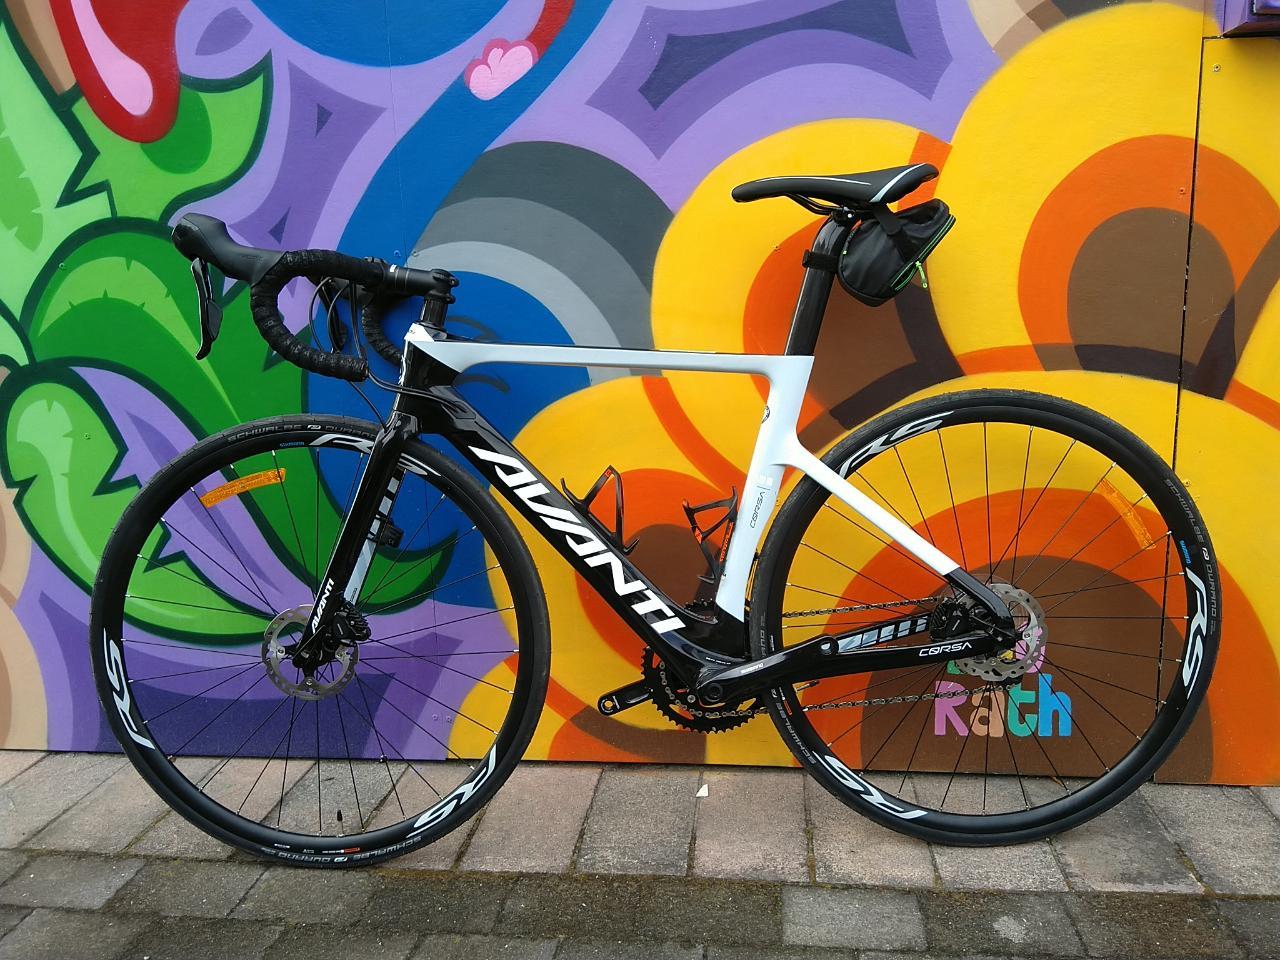 Avanti Corsa DR (Drag reducing) Road Bike Hire (November Ironman hire) 52 and 53.5 available